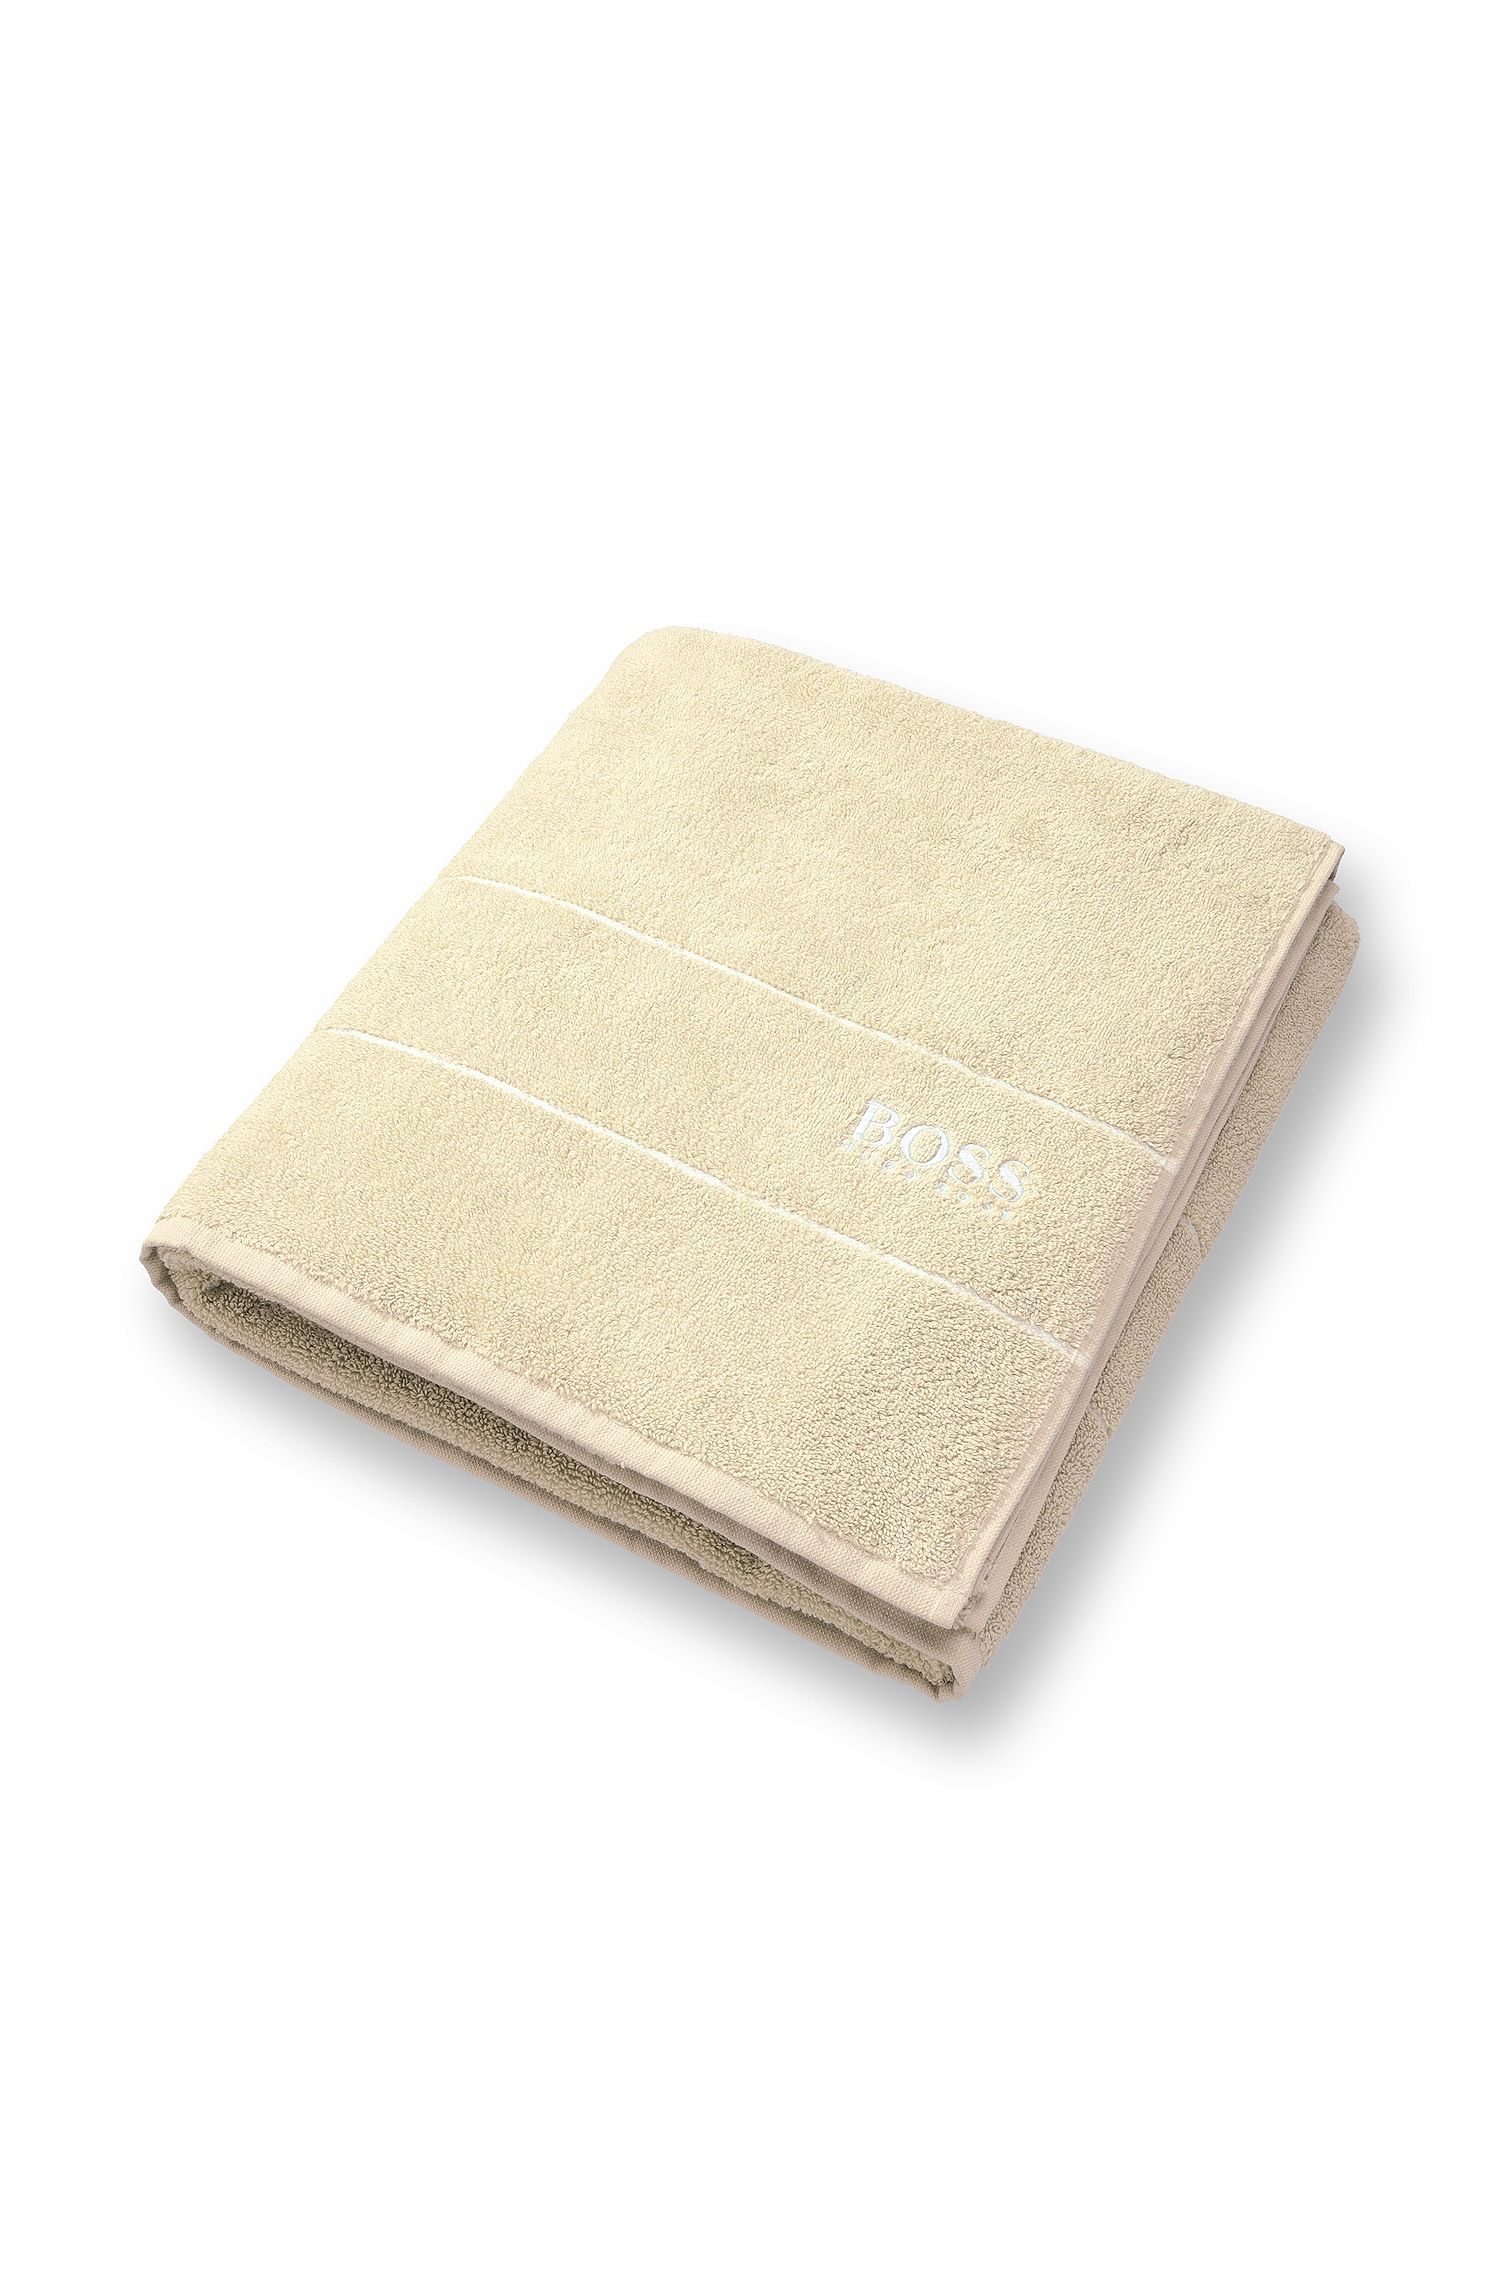 Finest Egyptian cotton bath sheet with logo border